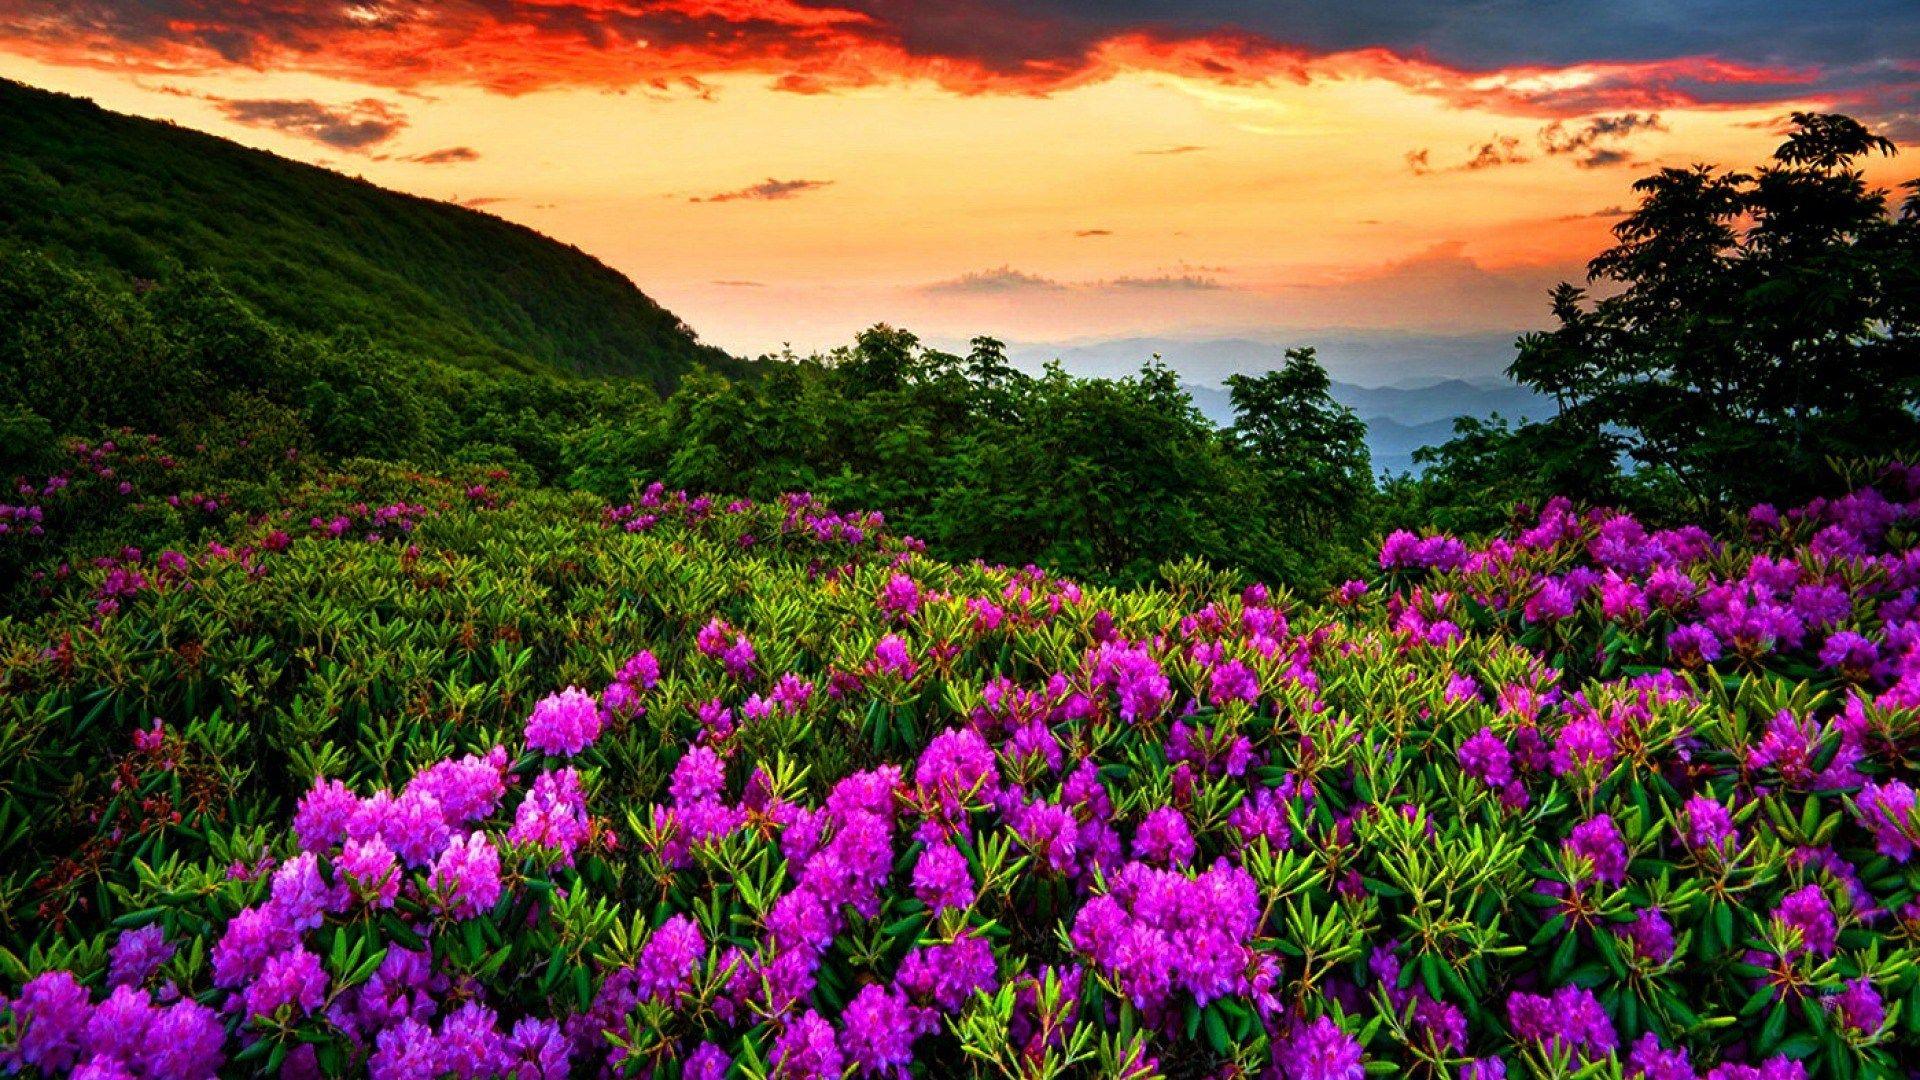 Beautiful Nature Spring Pictures Full Hd S Izobrazheniyami Naturalnyj Fotografii Prirody Pejzazhi